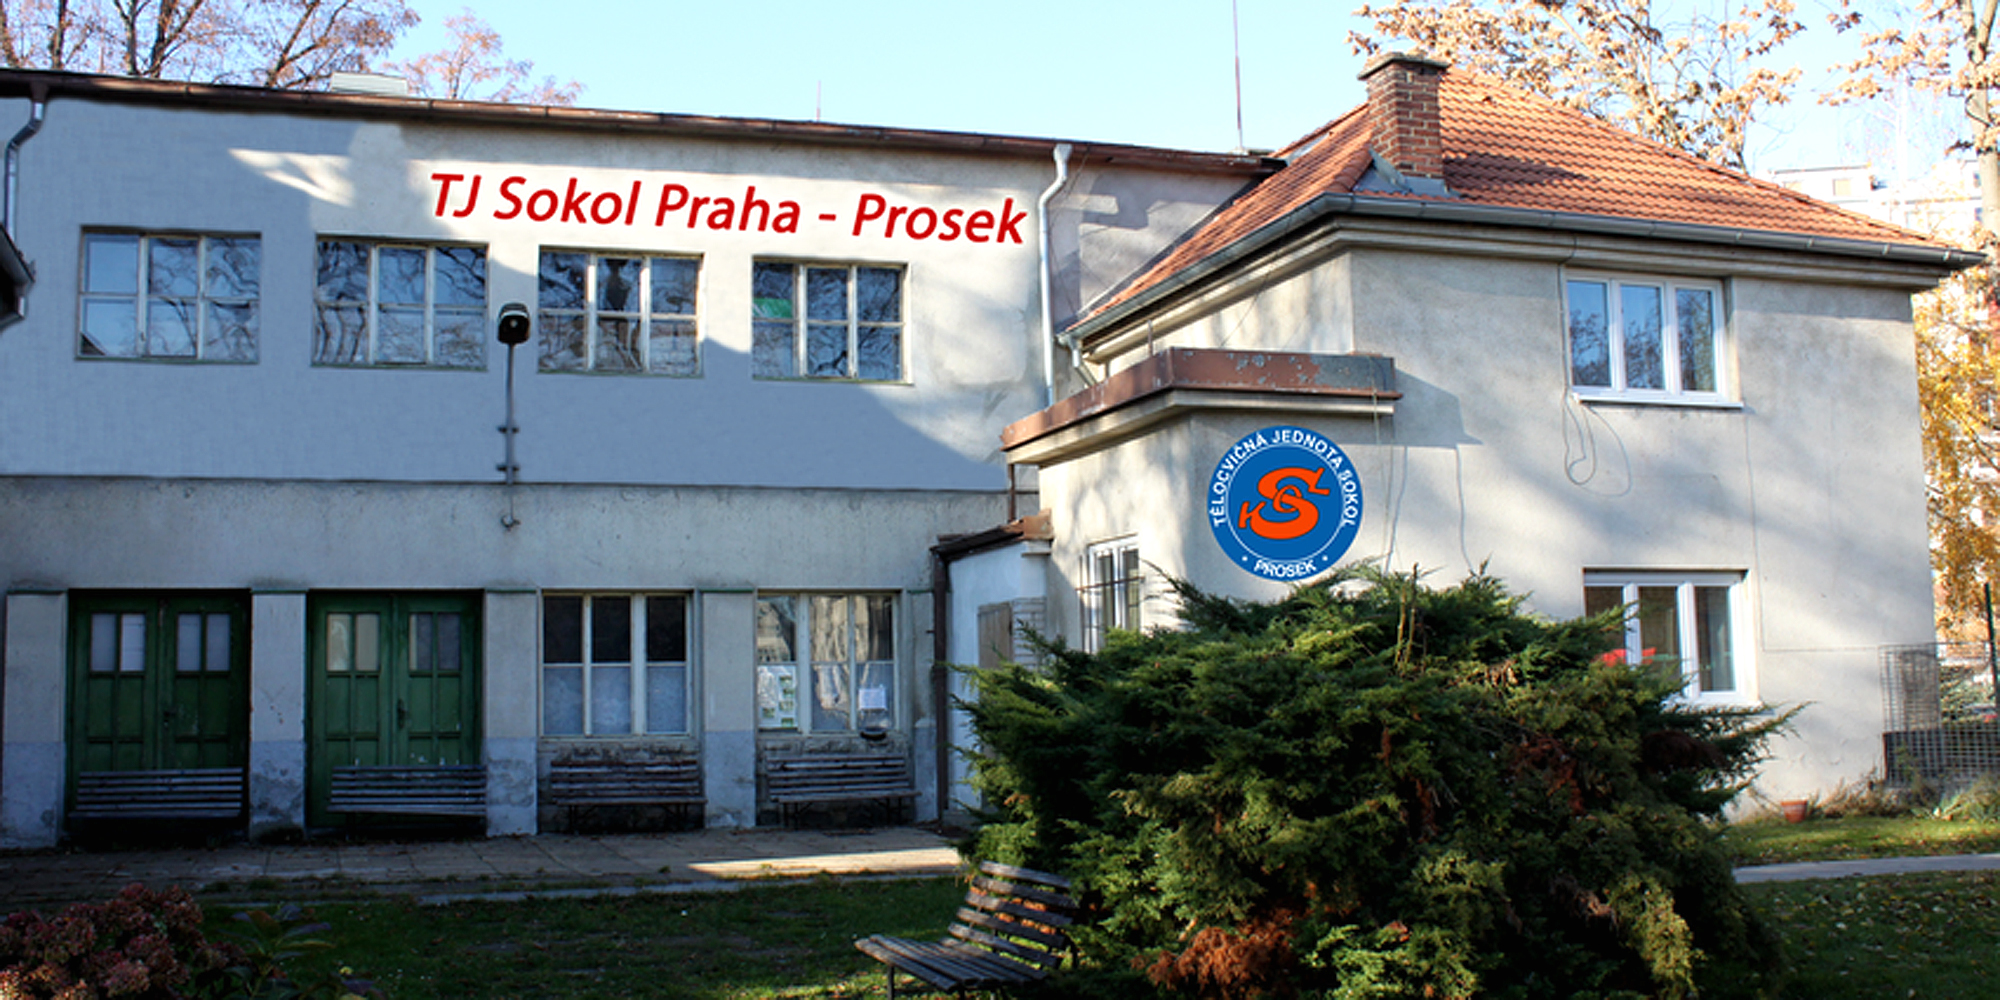 TJ Sokol Prosek